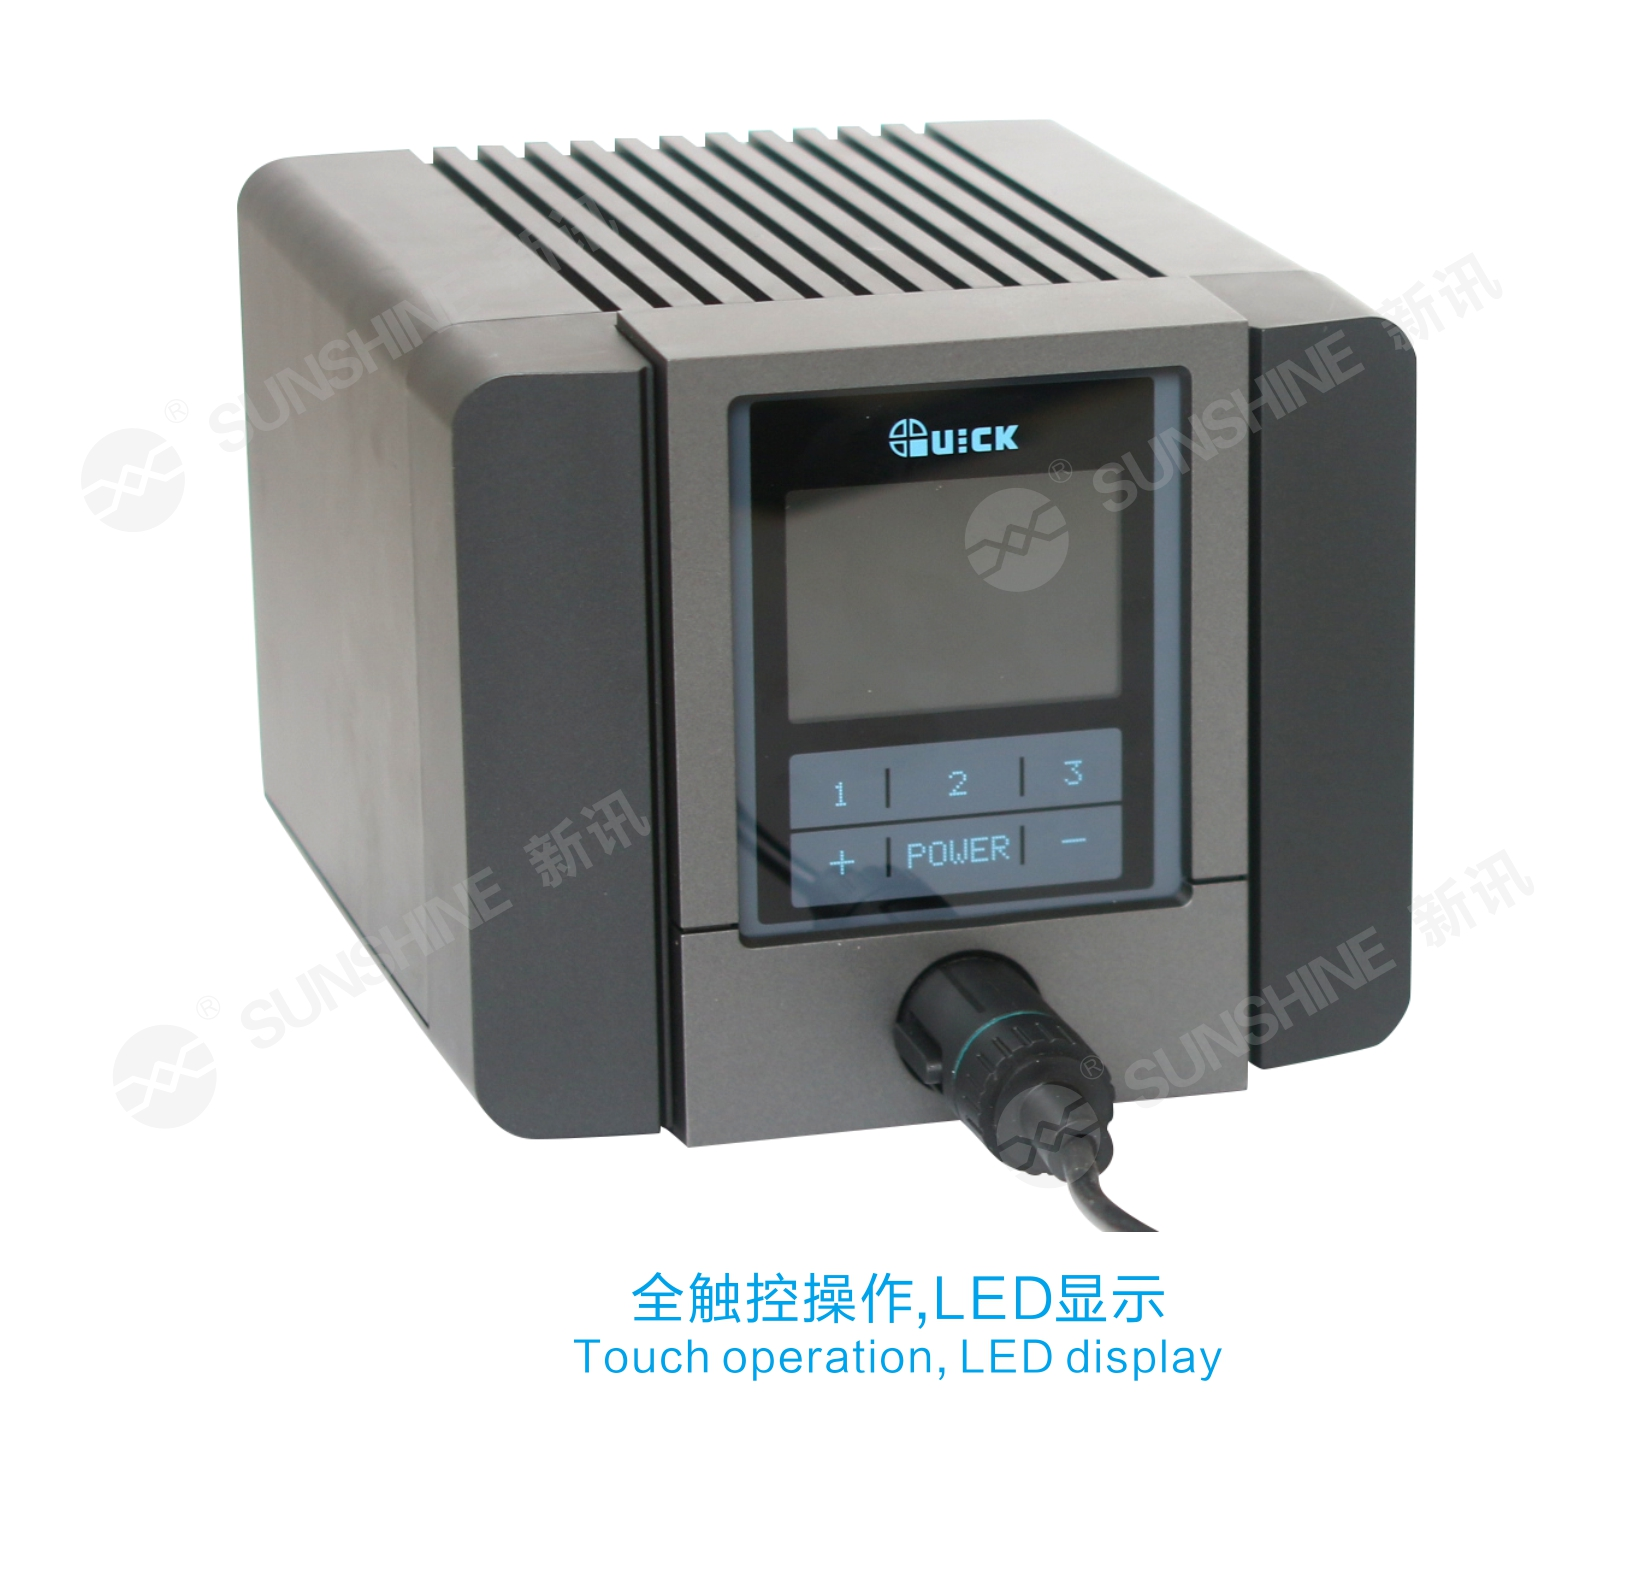 QUICK TS1200A 120W Intelligent Lead Free Solder StationQUICK TS1200A 120W Intelligent Lead Free Solder Station